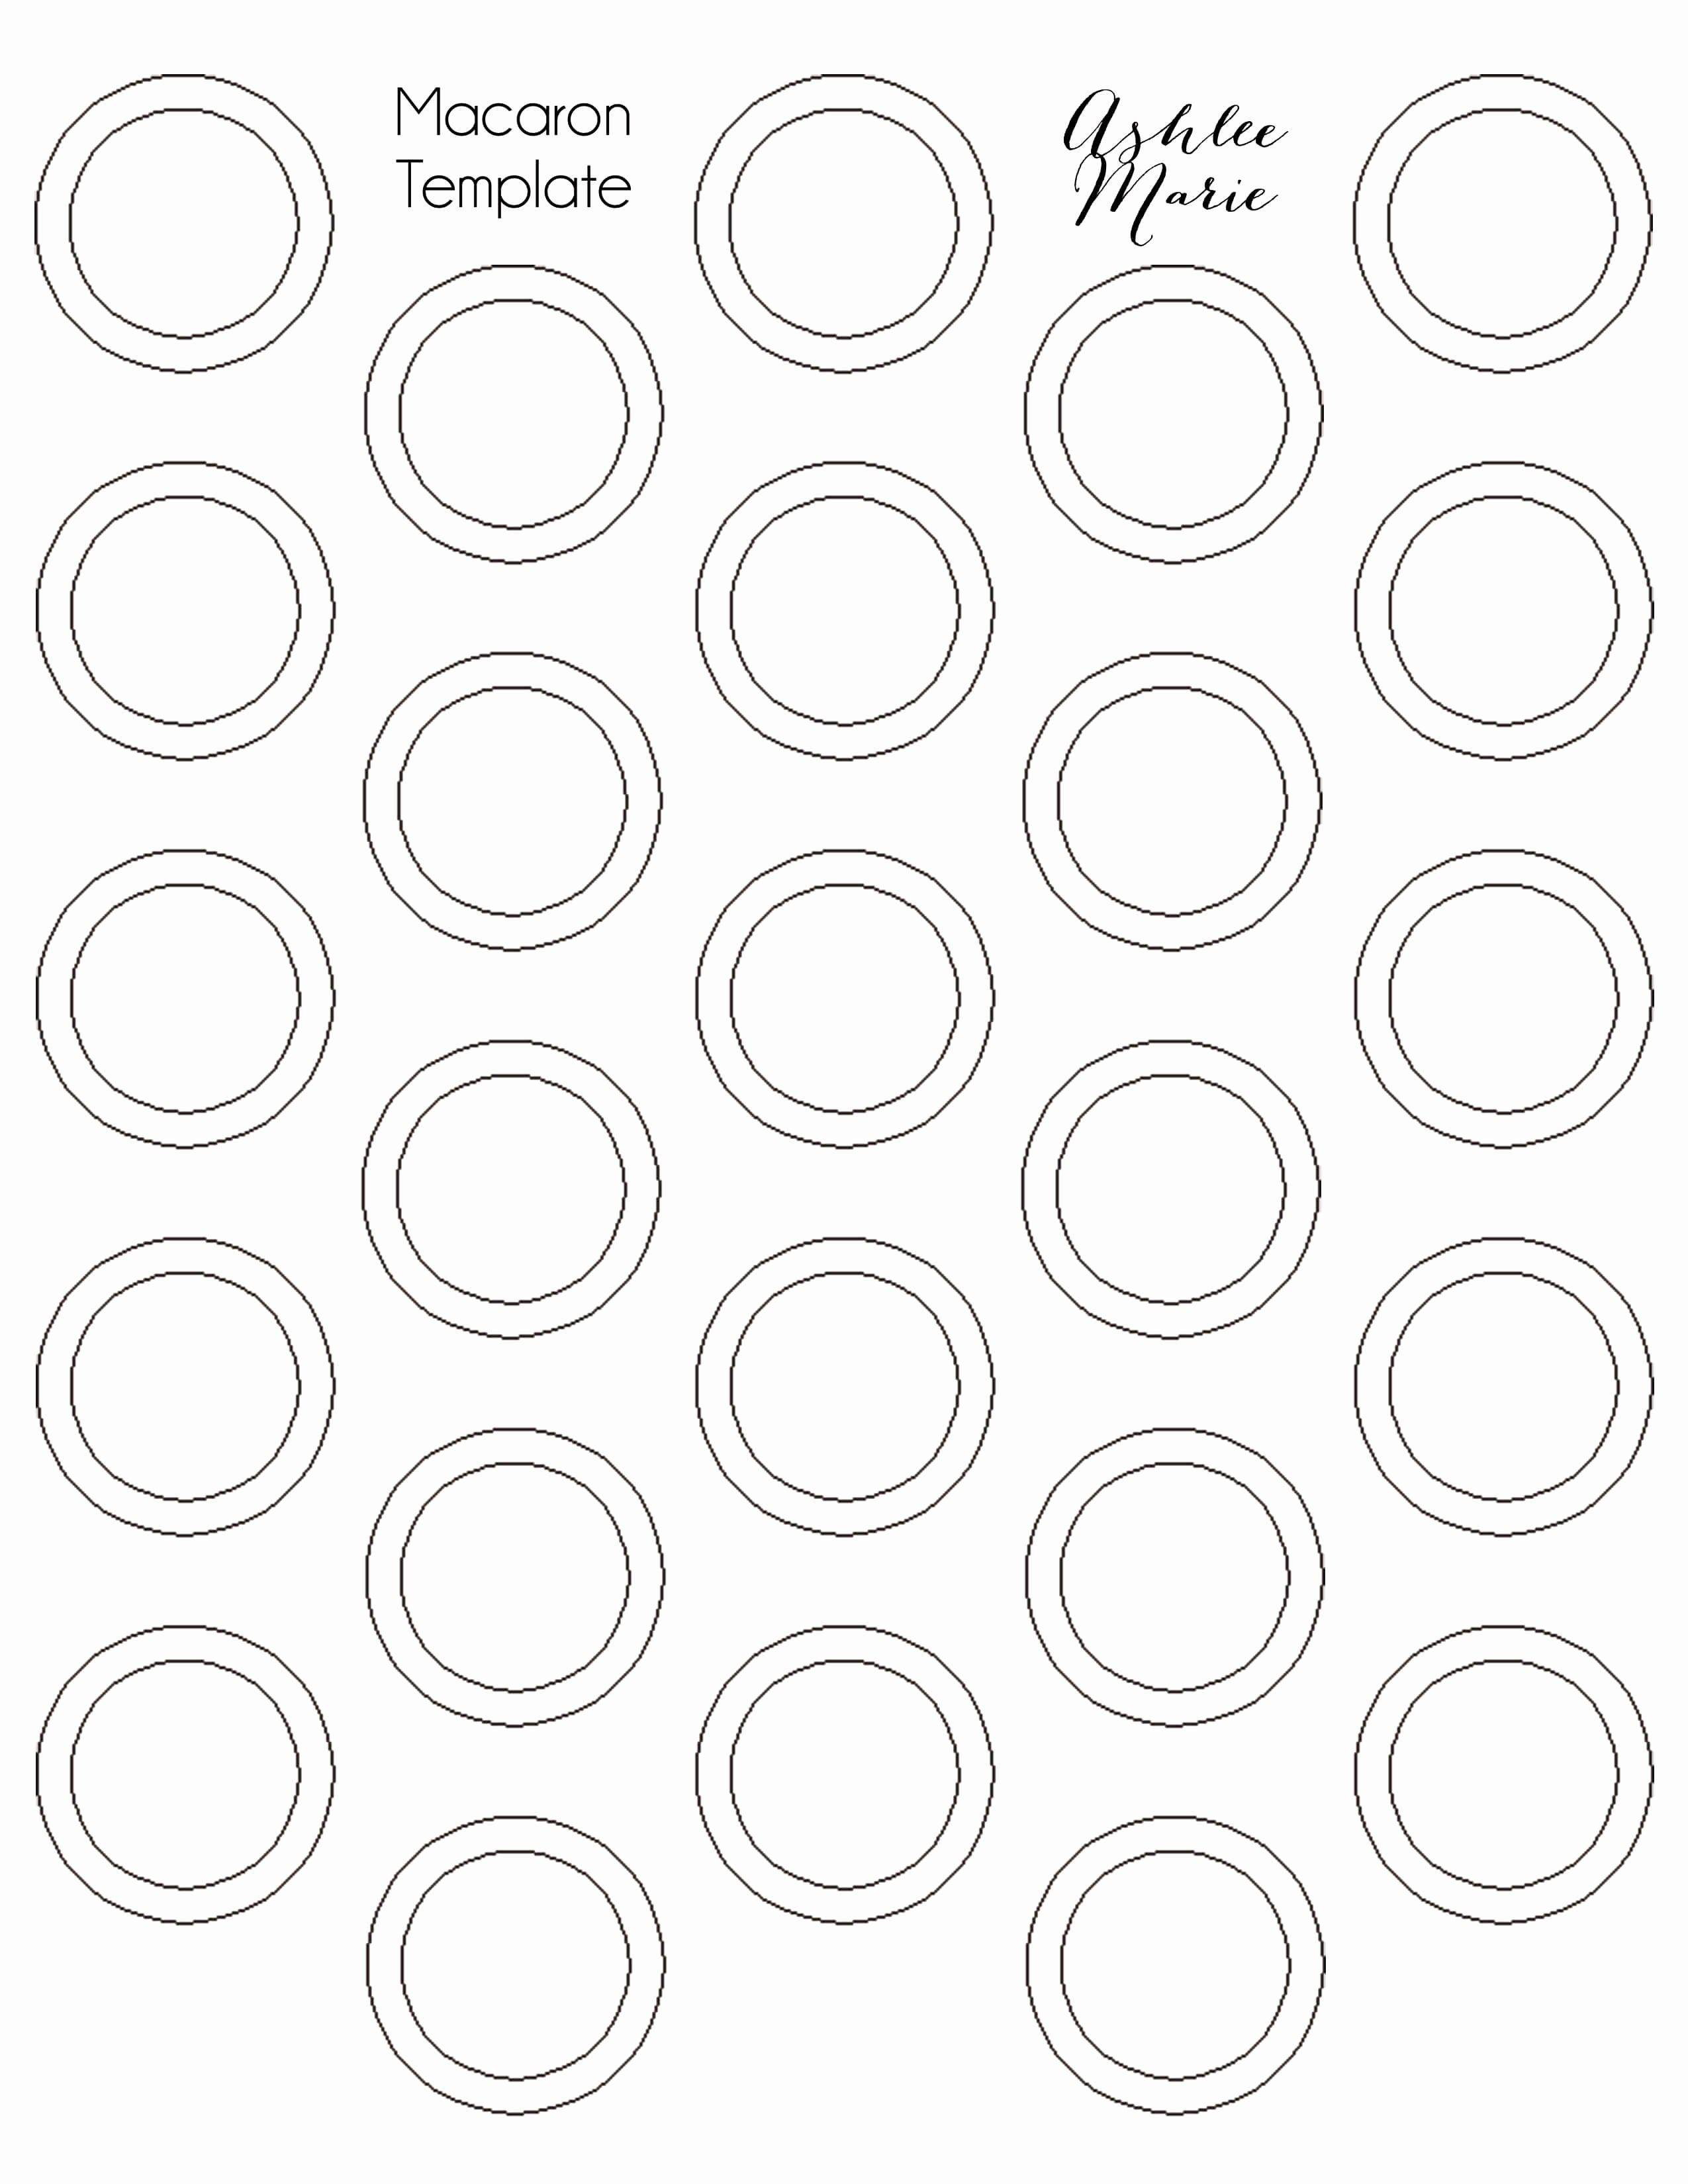 Design A button Template Inspirational Chocolate Mint Macarons